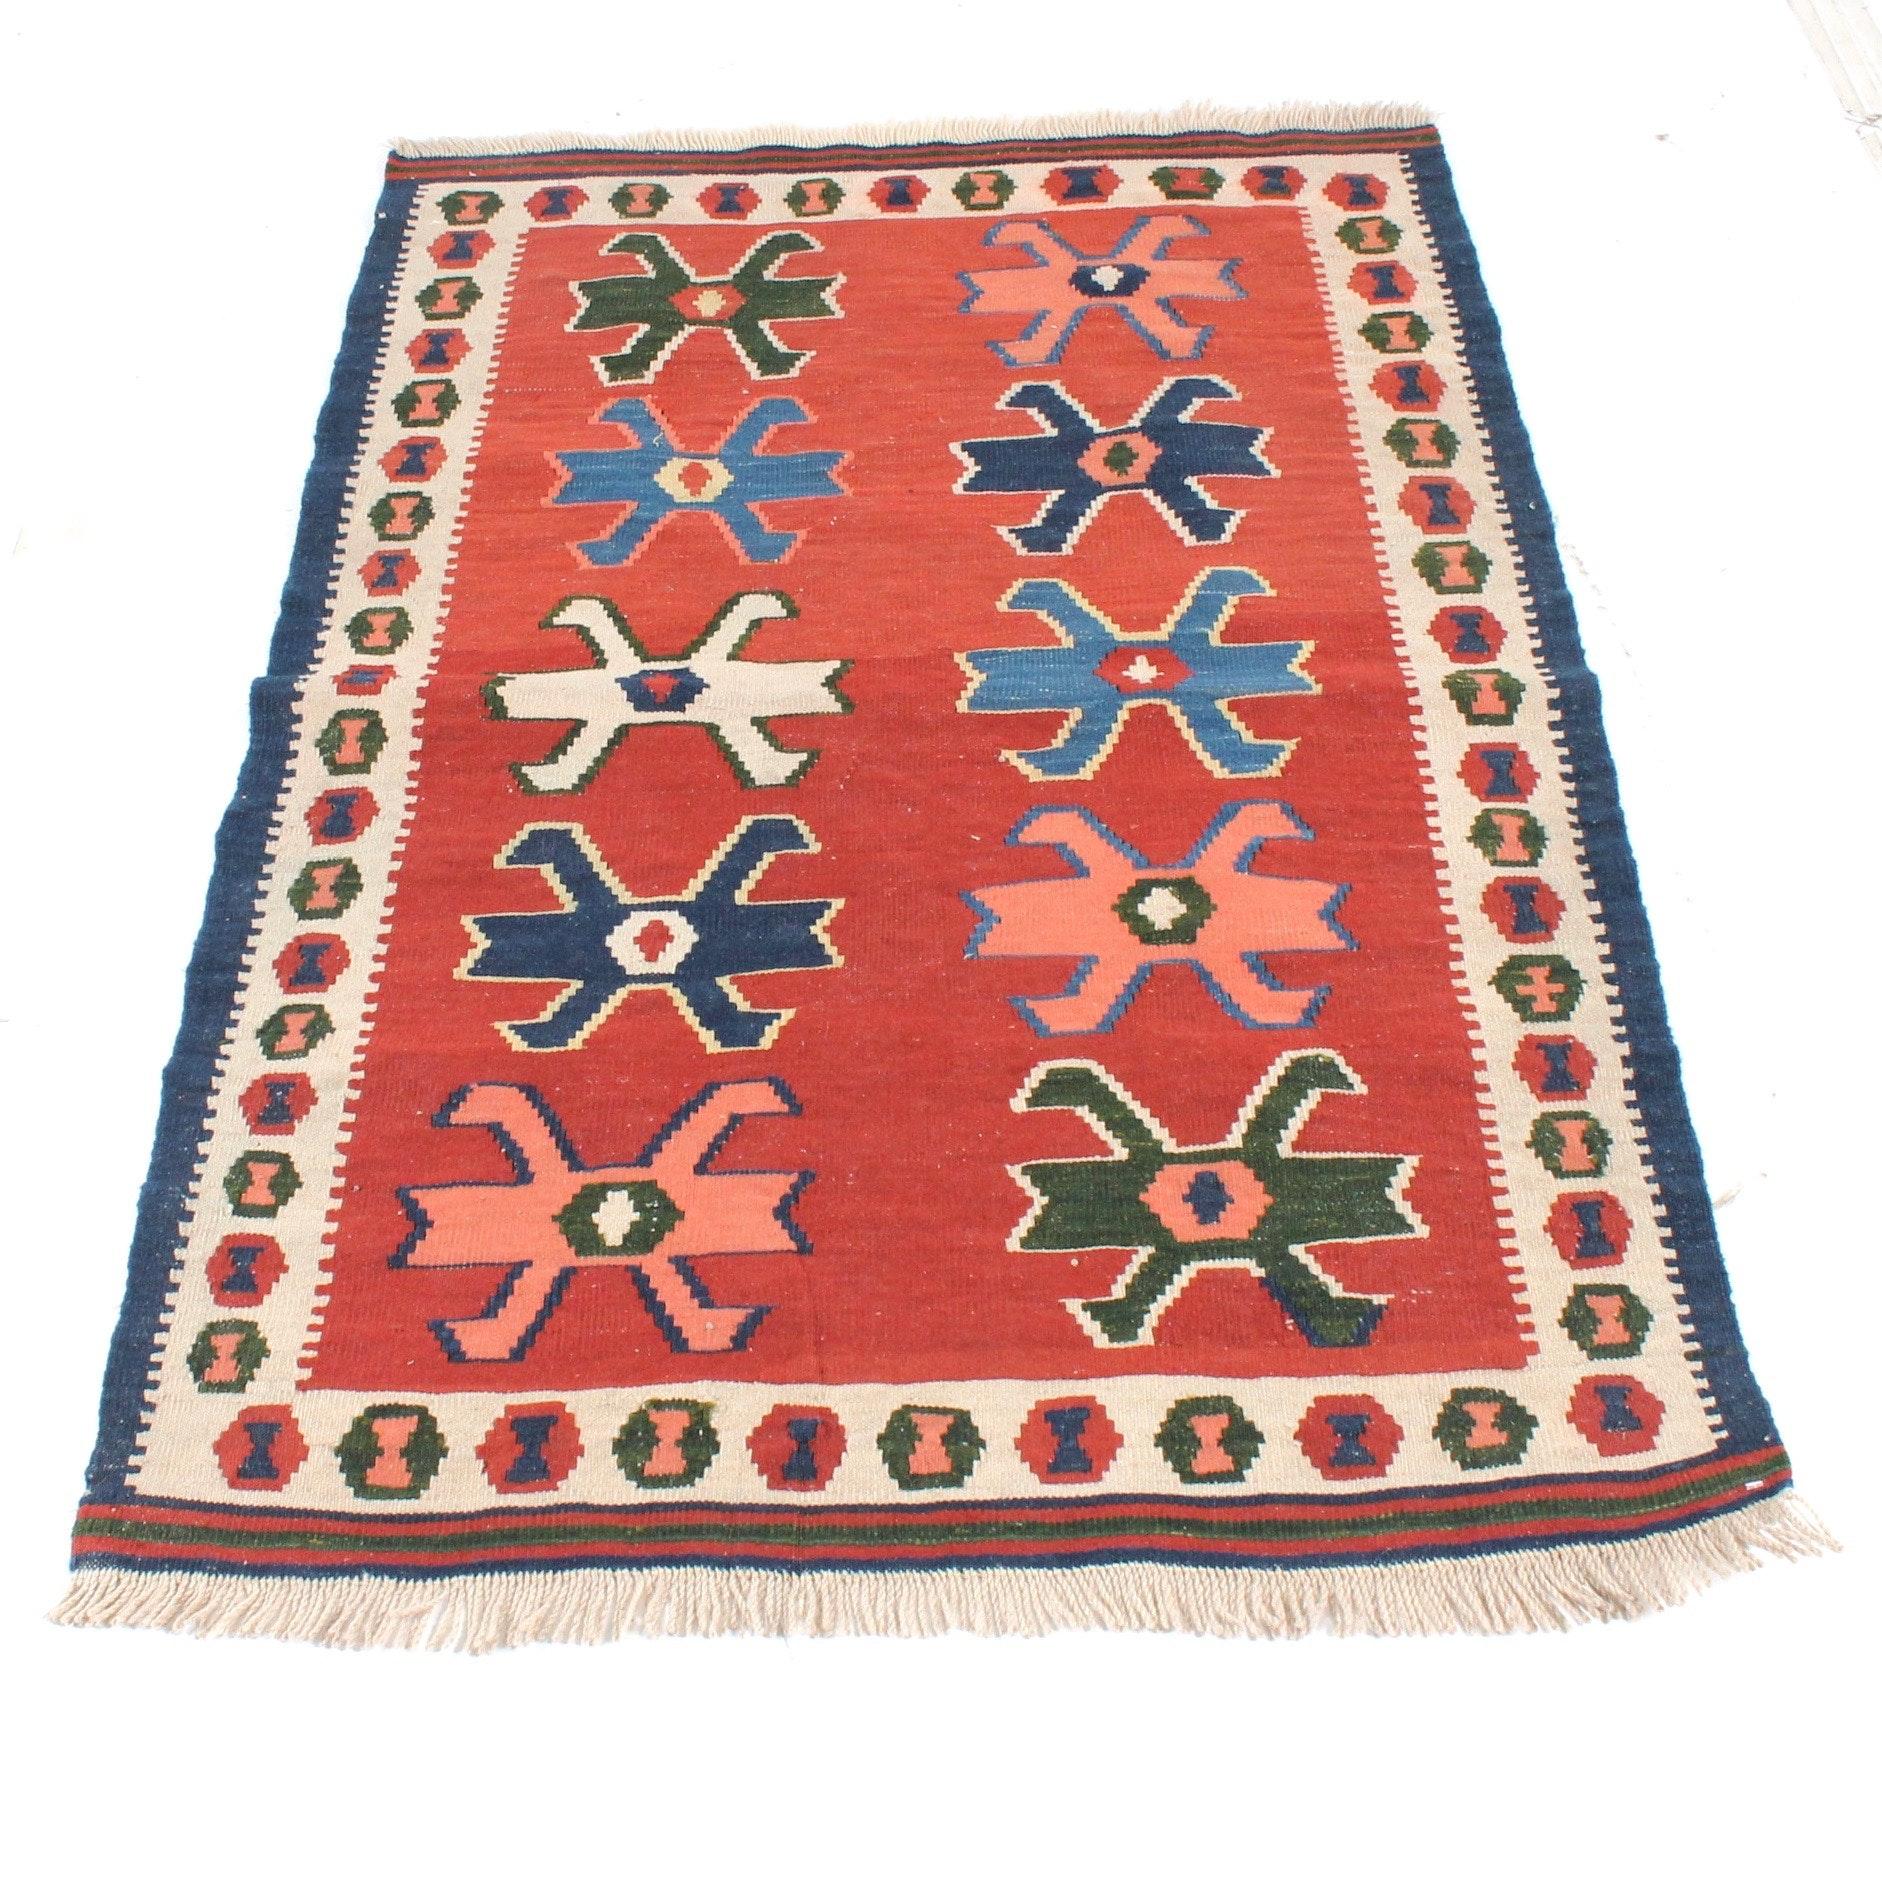 Semi-Antique Handwoven Persian Varamin Kilim Rug